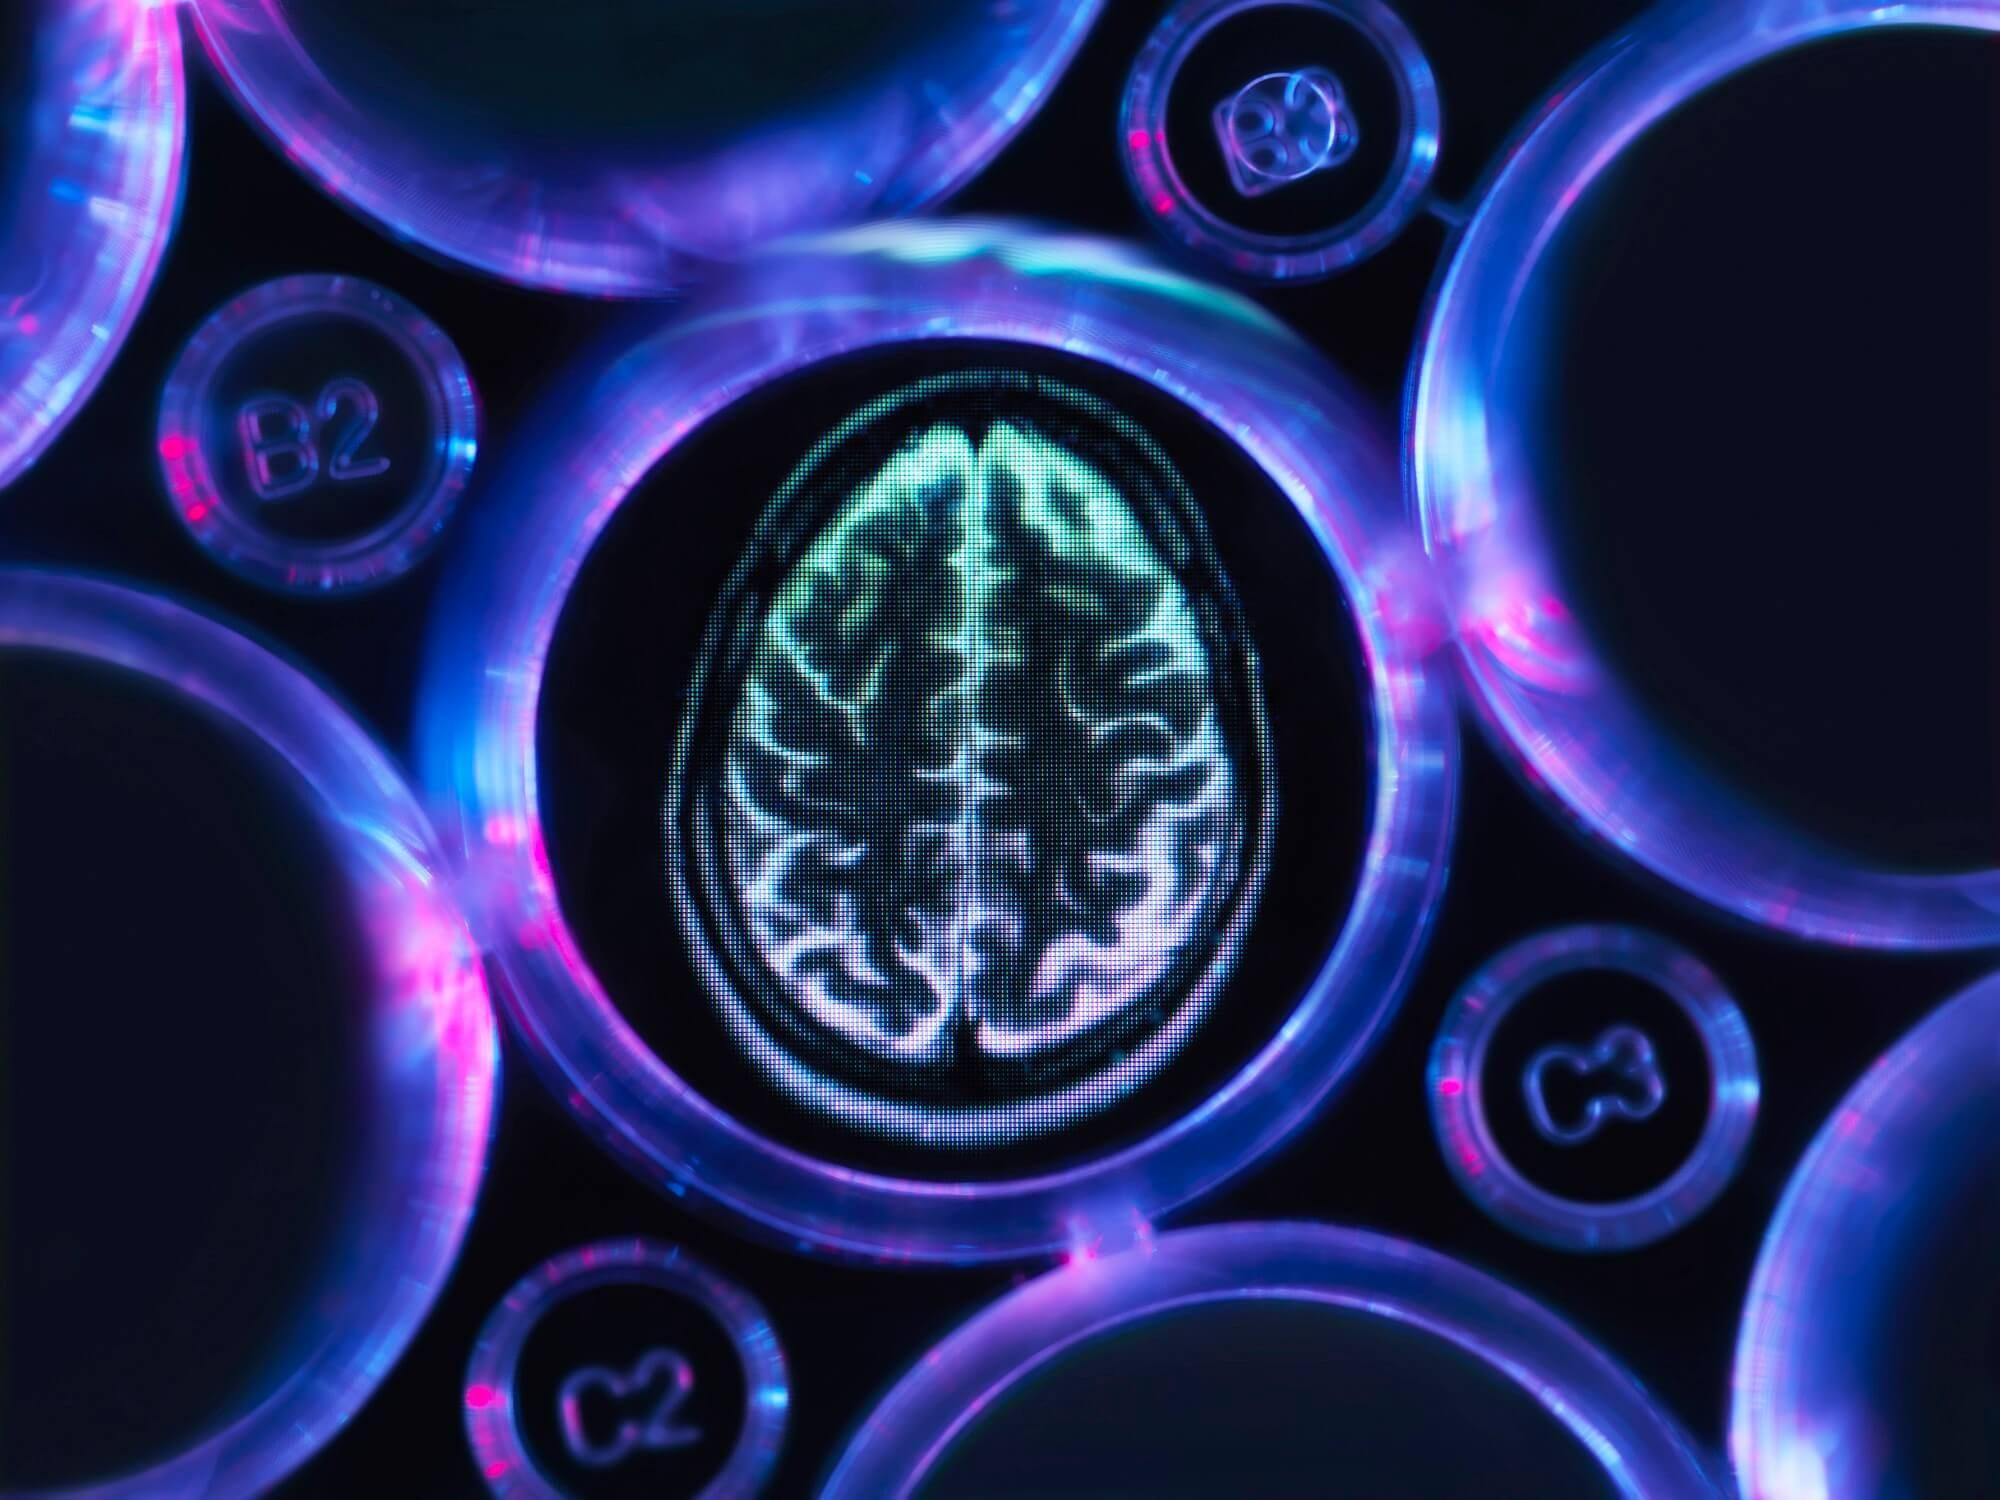 Cognitive Decline Similar After Heart Surgery, Cardiac Catheterization